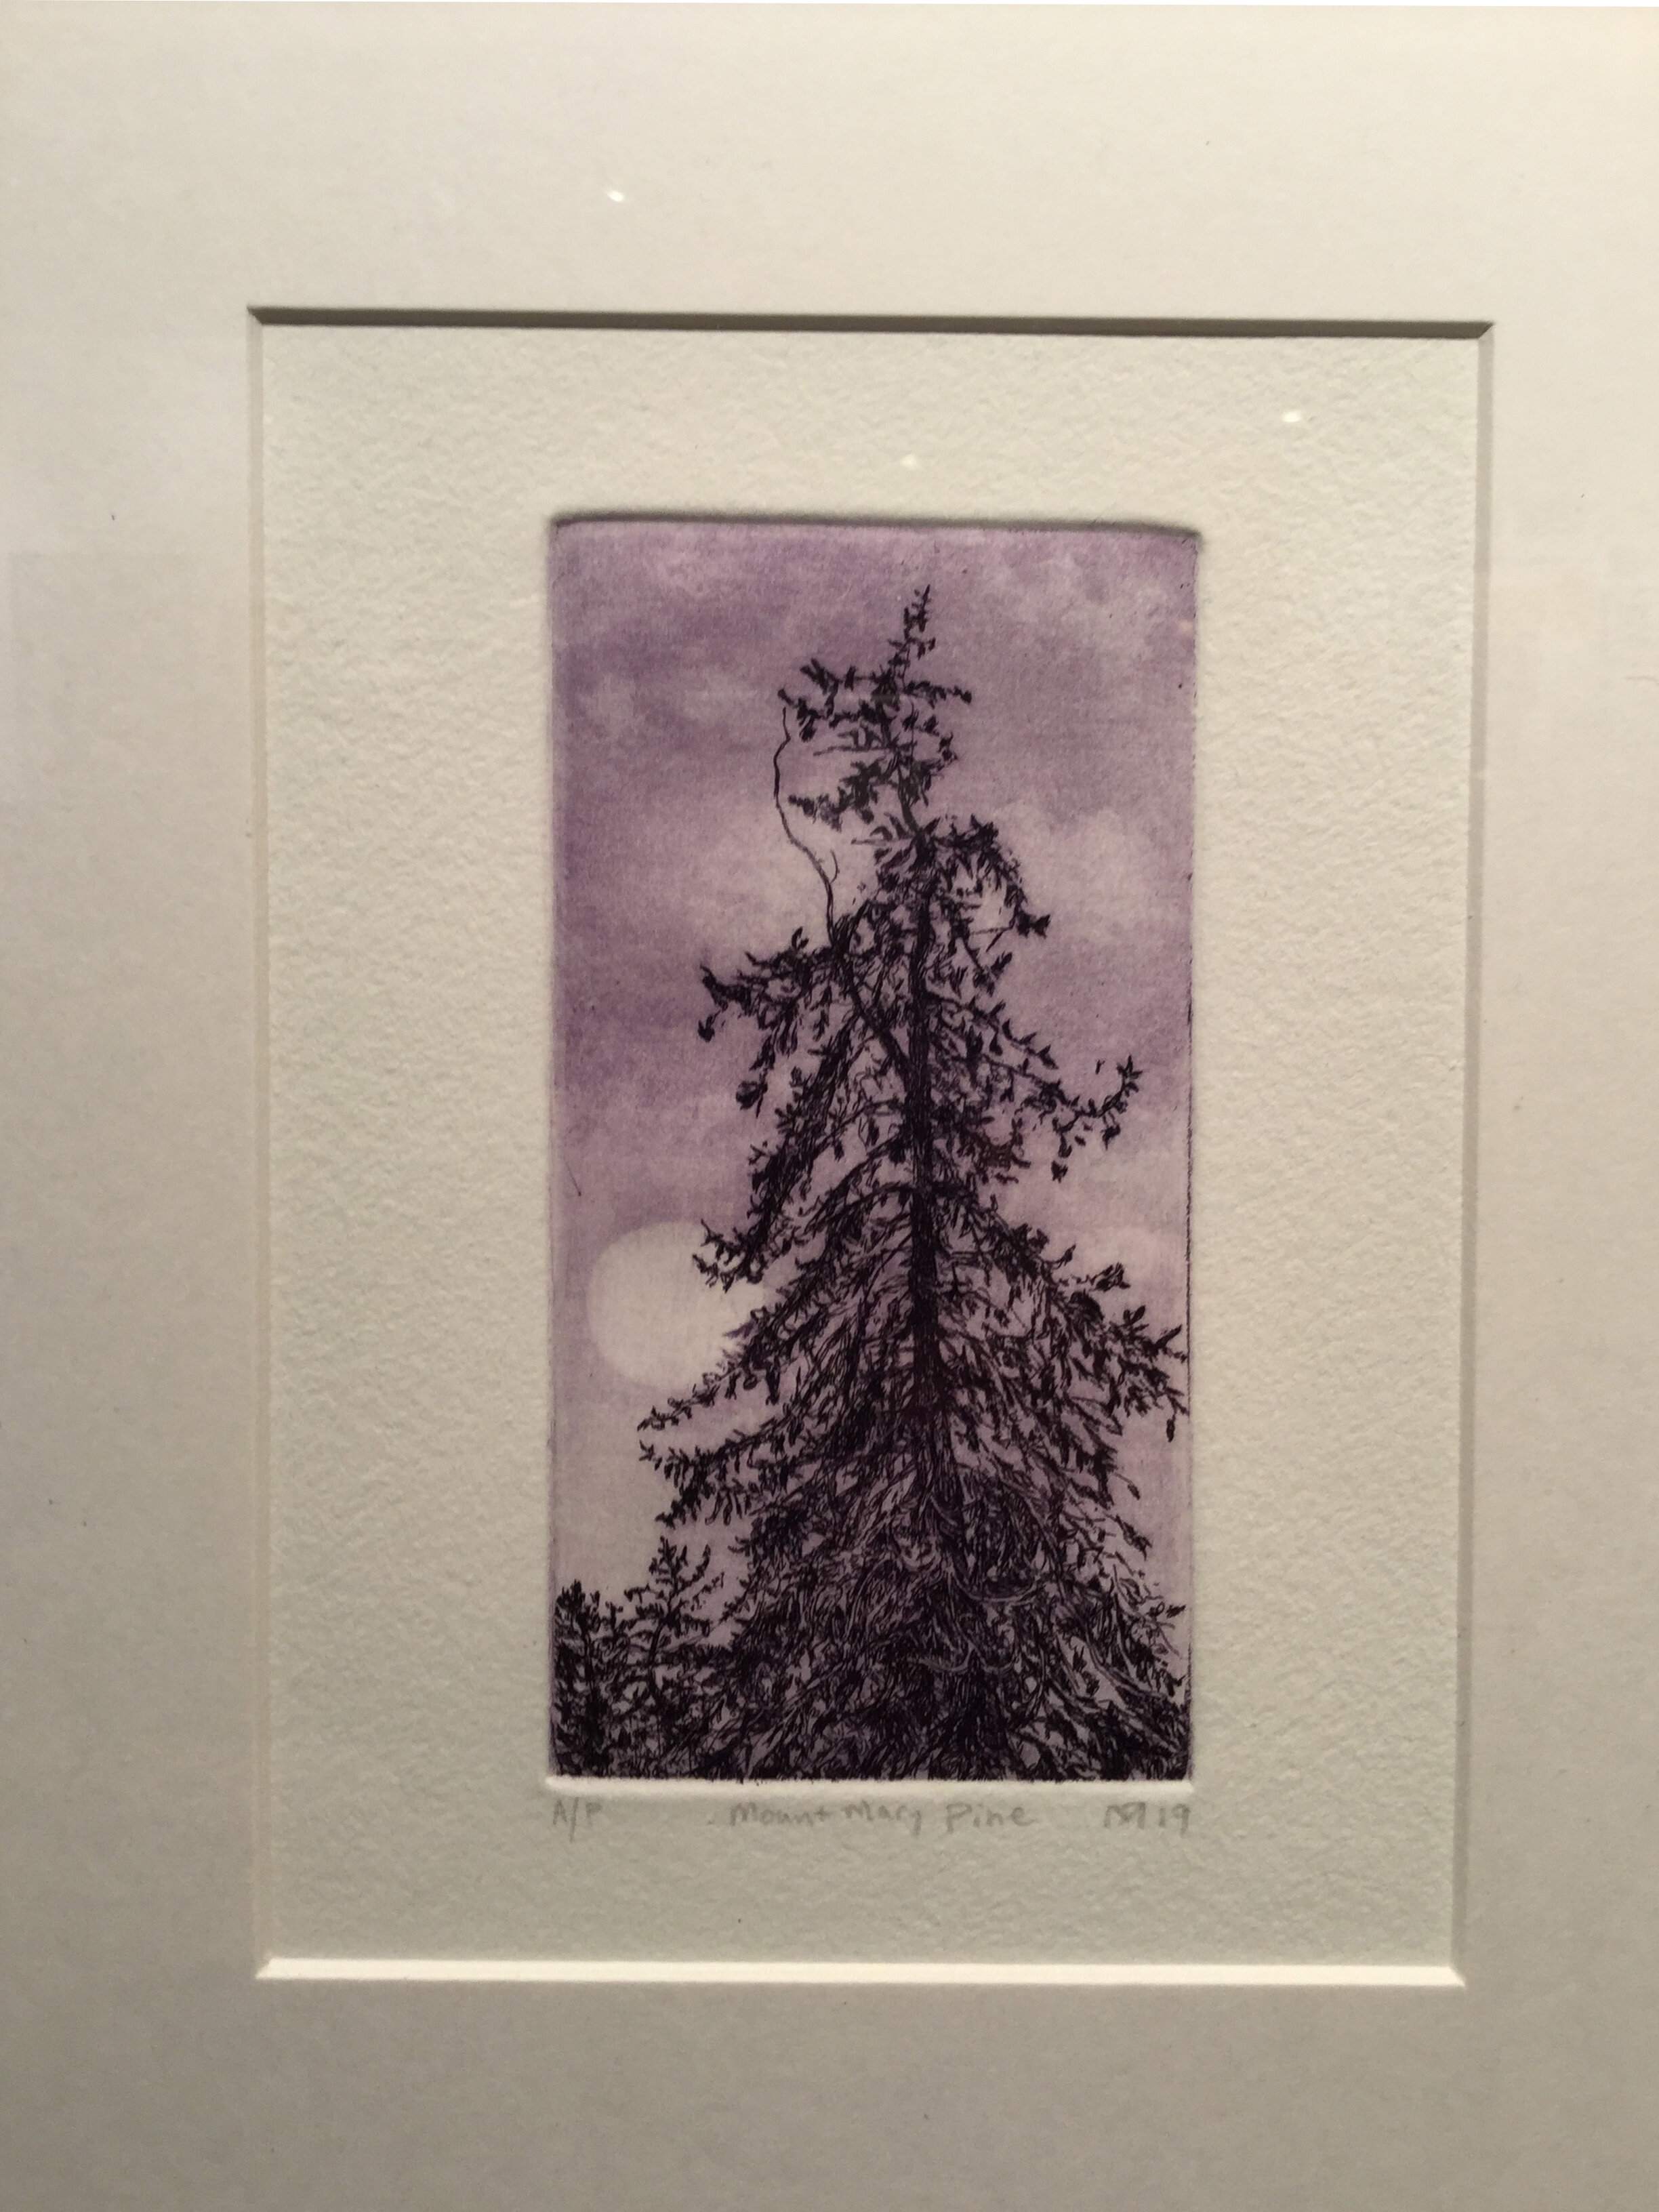 mount-mary-pine-print.jpg